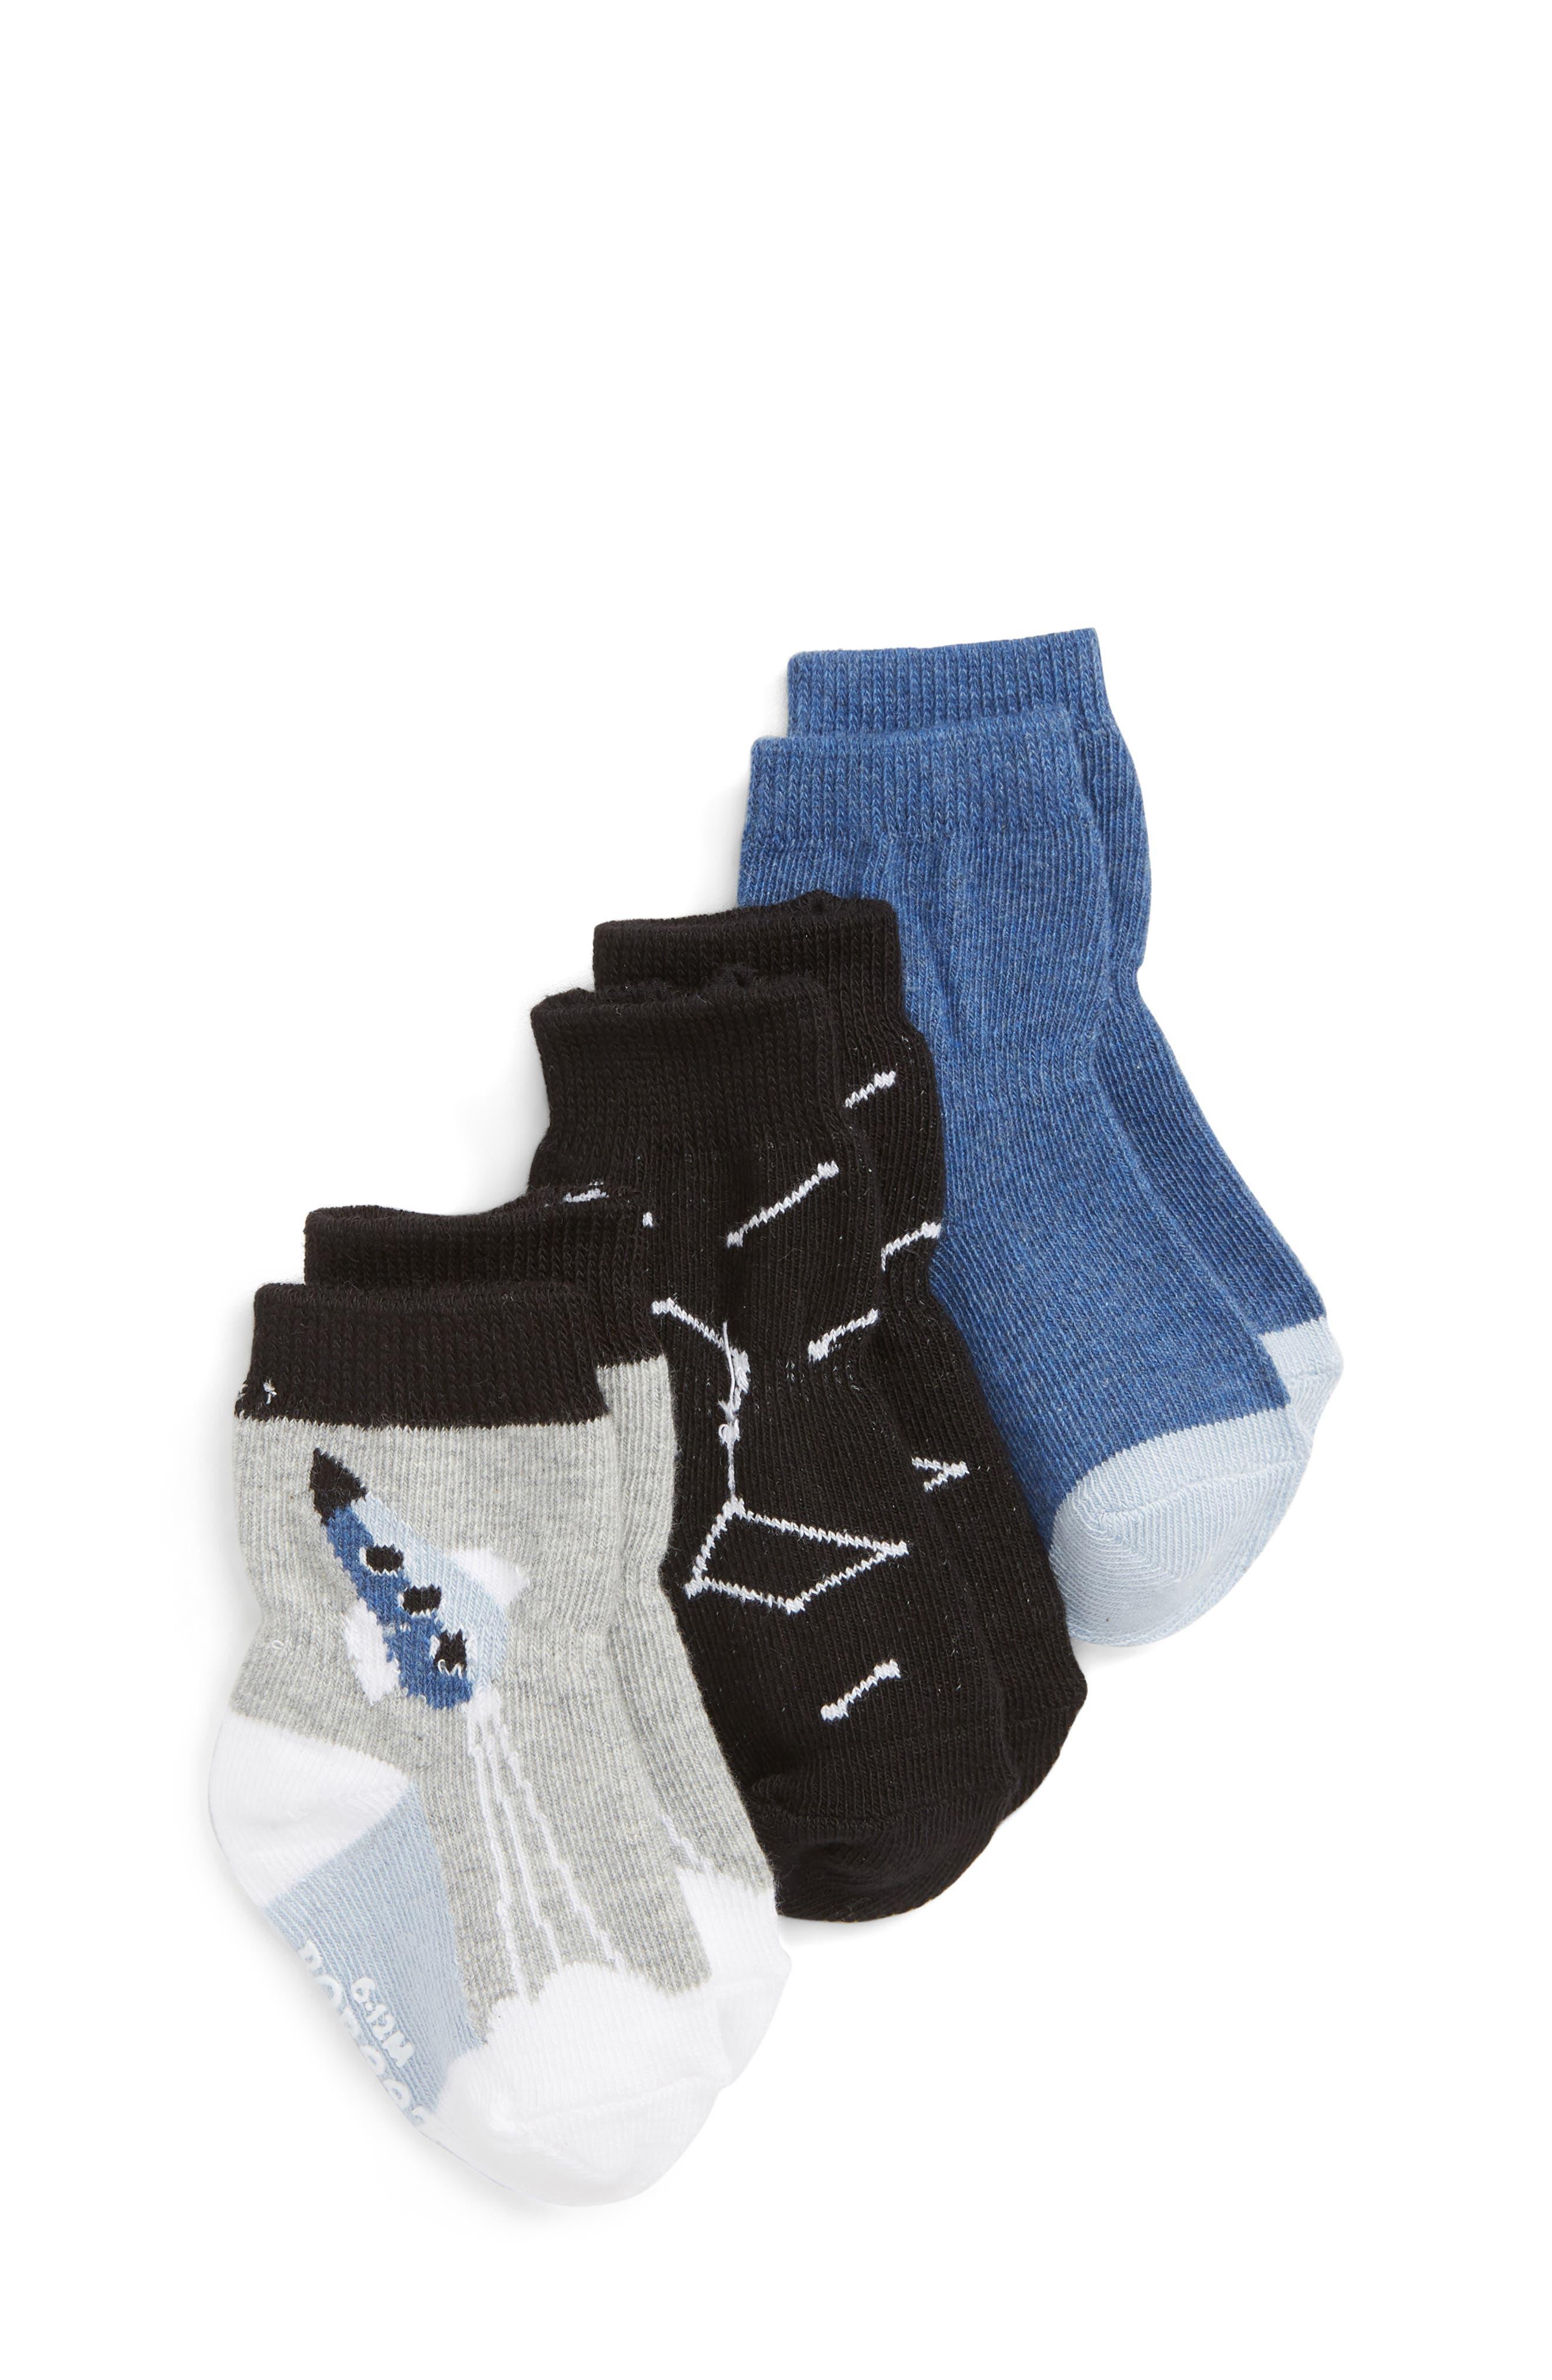 Blast Off 3-Pack Socks,                             Main thumbnail 1, color,                             BLACK/ GREY/ BLUE